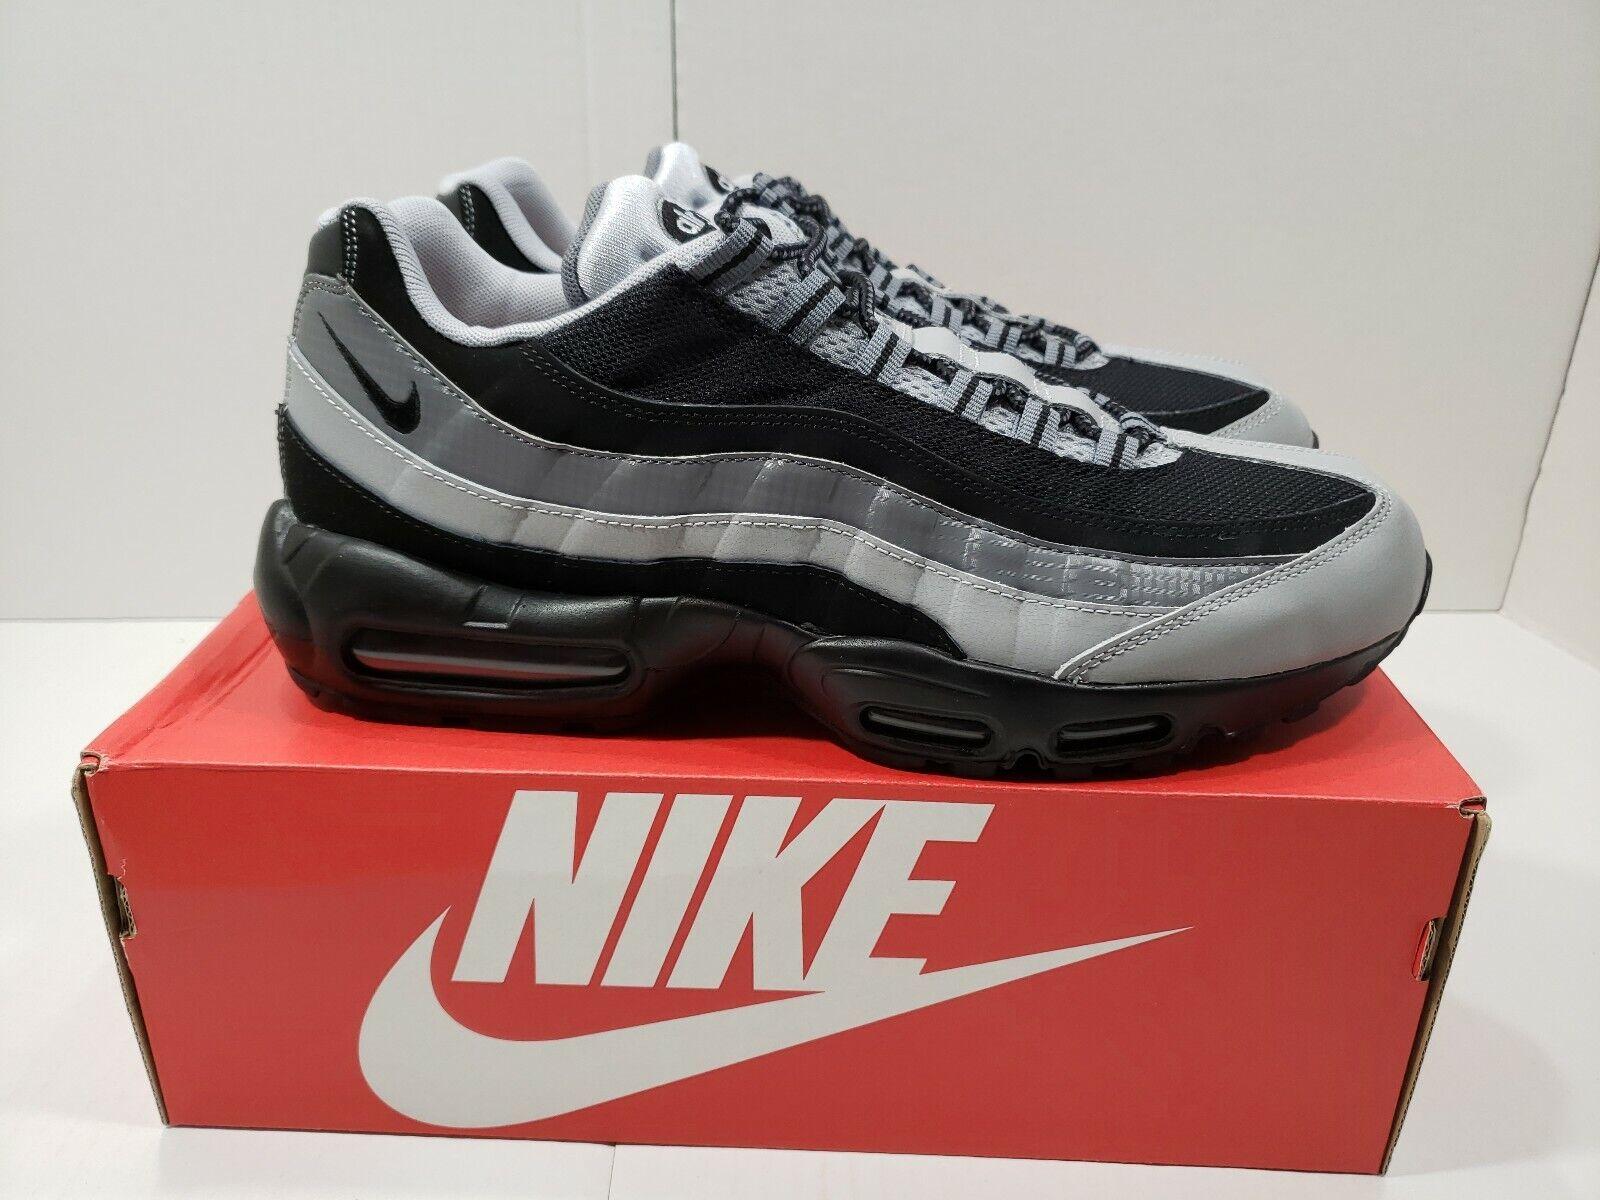 0c16ac94ada Nike Air Max Max Max 95 Essential Black Wolf 749766-005 Size 13 Brand New